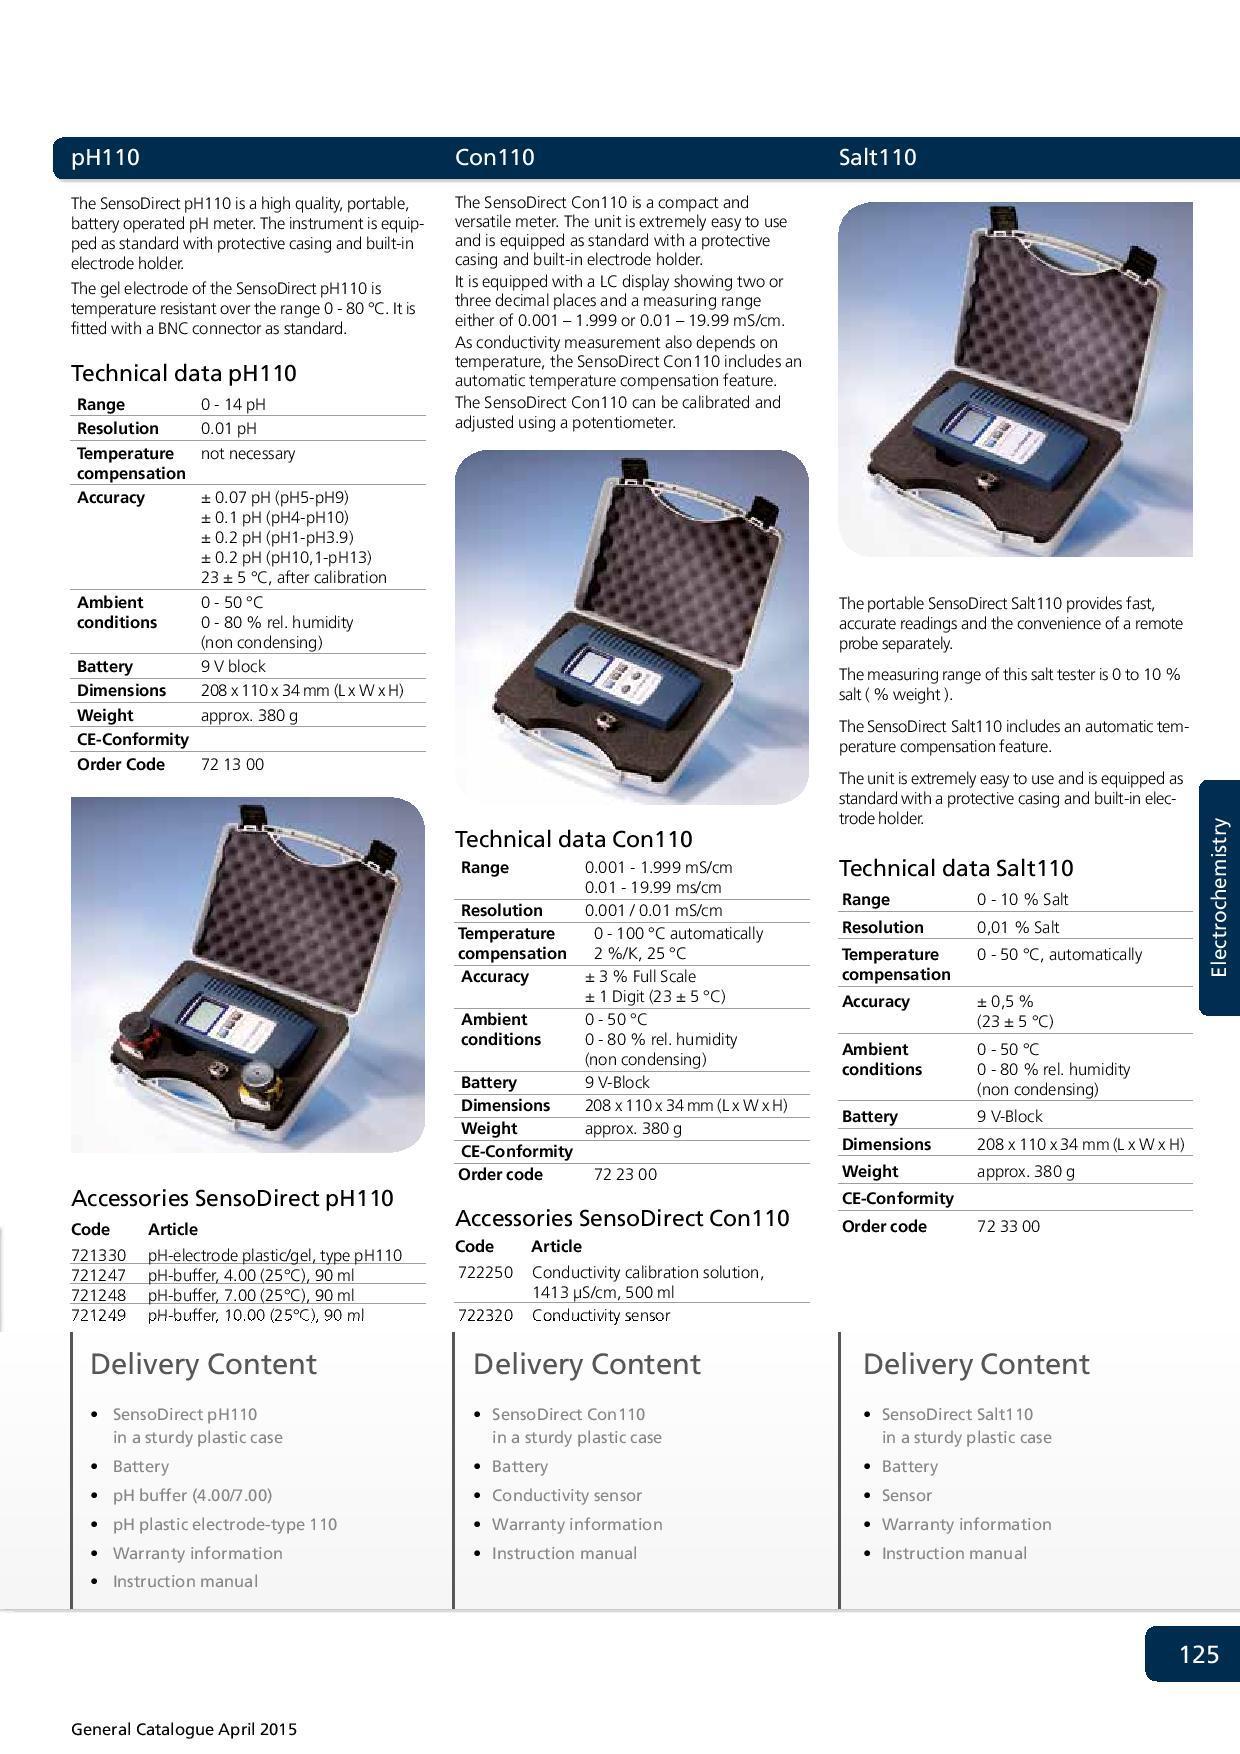 SensoDirect Tintometer 110 pH